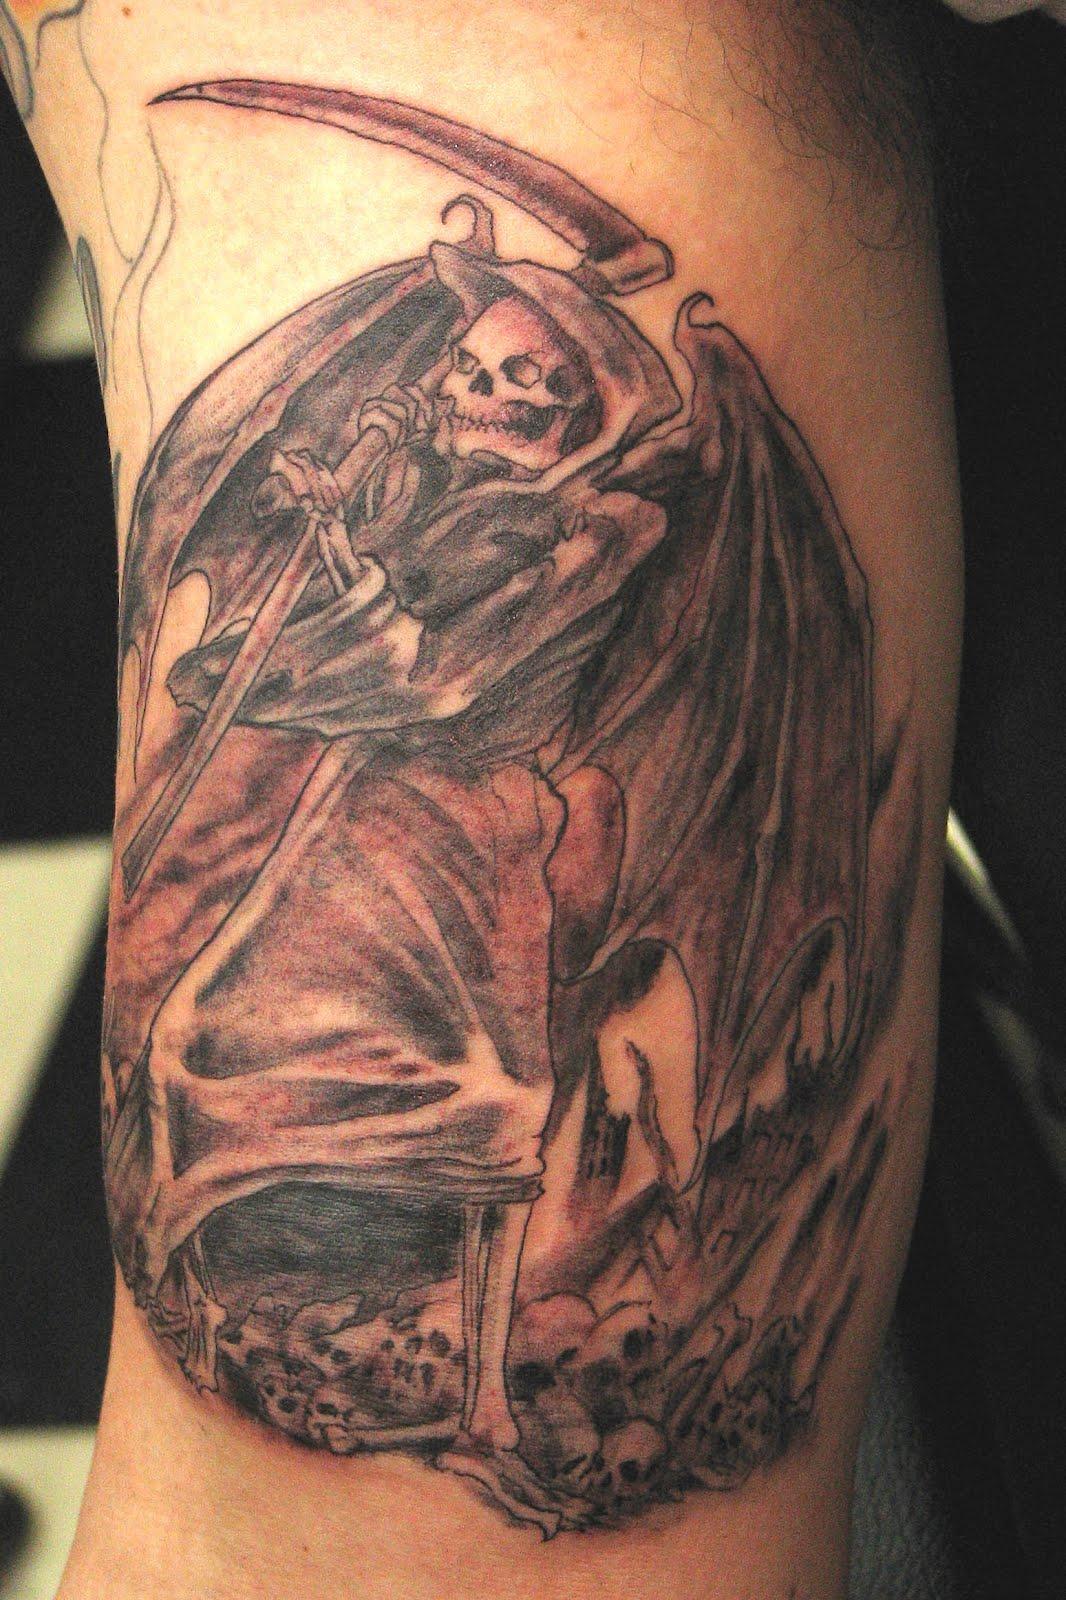 Tattoo art: September 2012